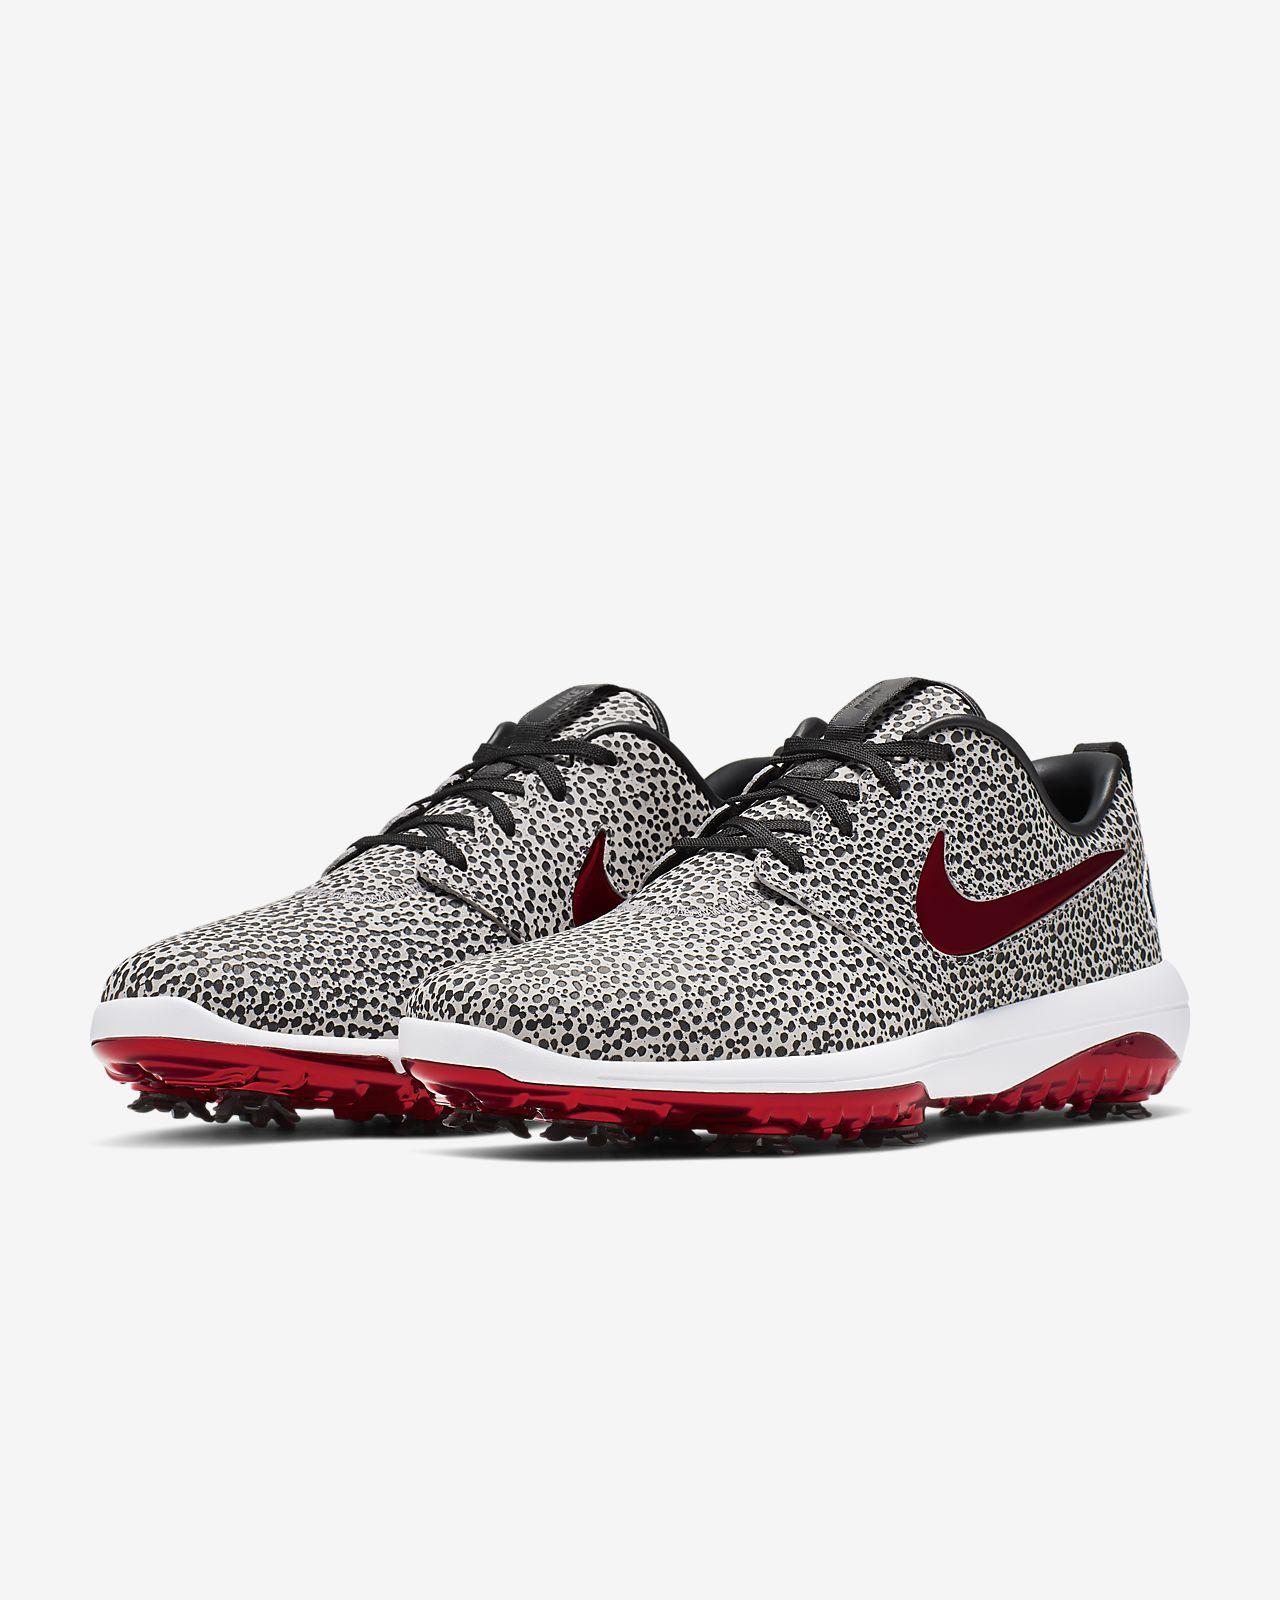 pretty nice f6276 a94b1 ... Chaussure de golf Nike Roshe G Tour NRG pour Homme